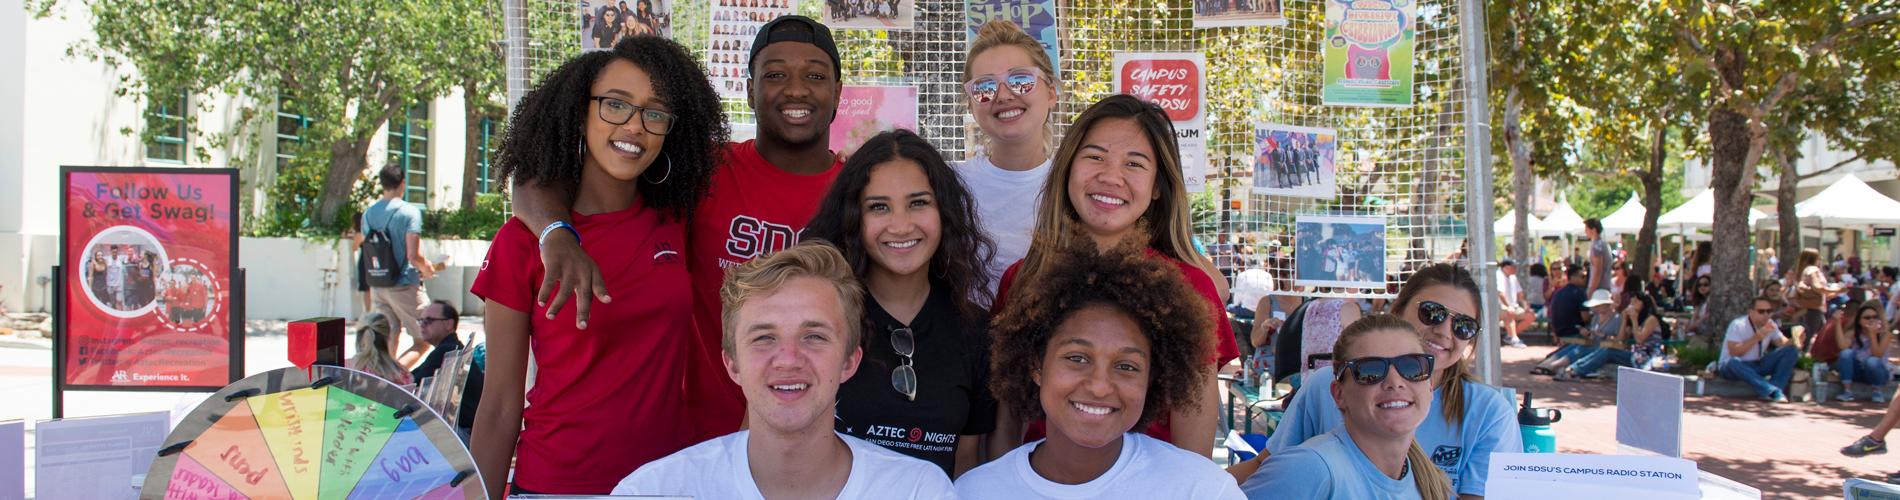 SDSU Students